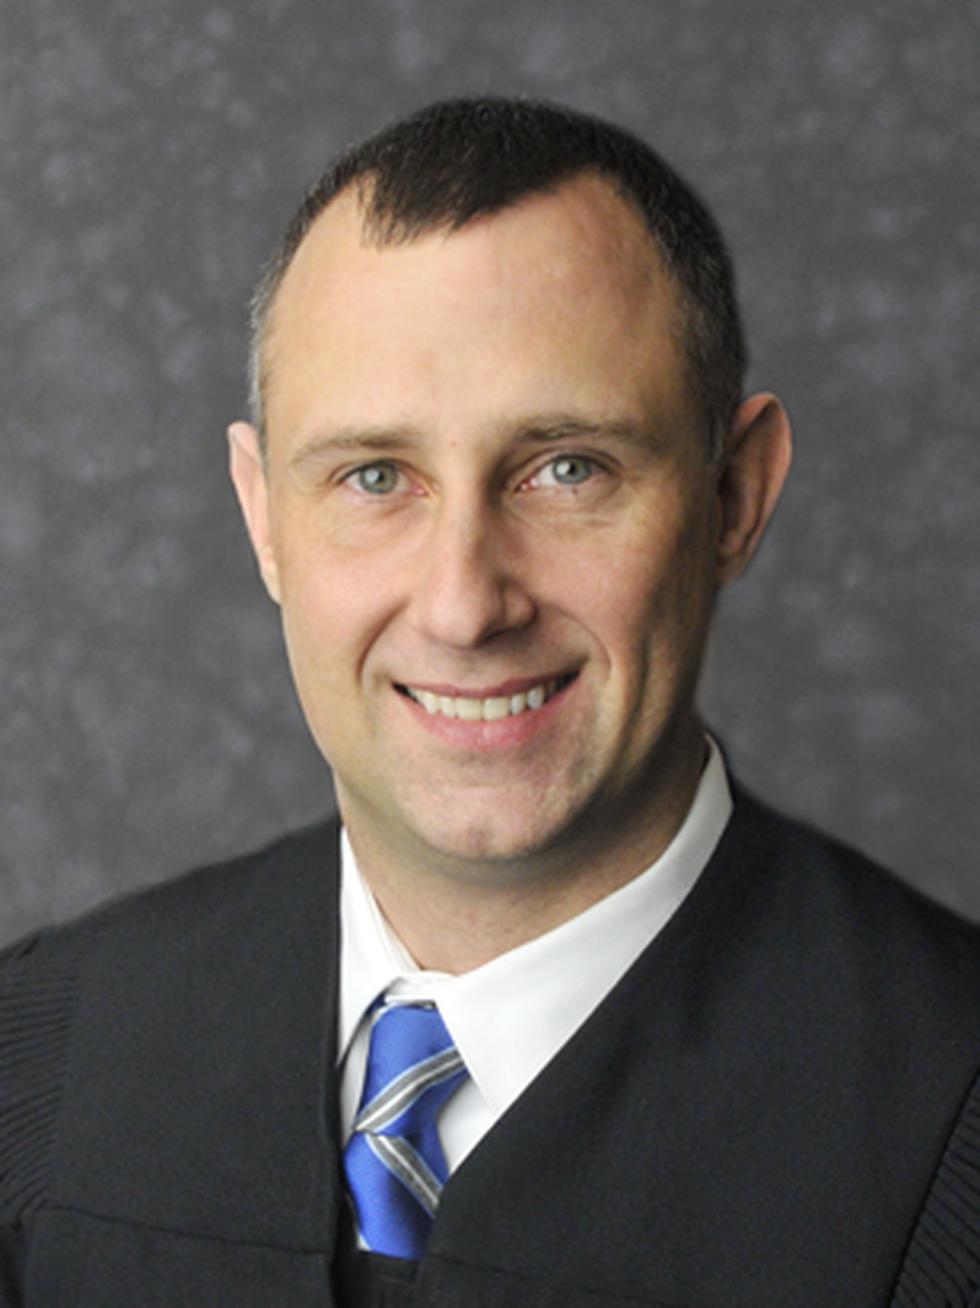 Bradley Jacobs (Source: Indiana Supreme Court)